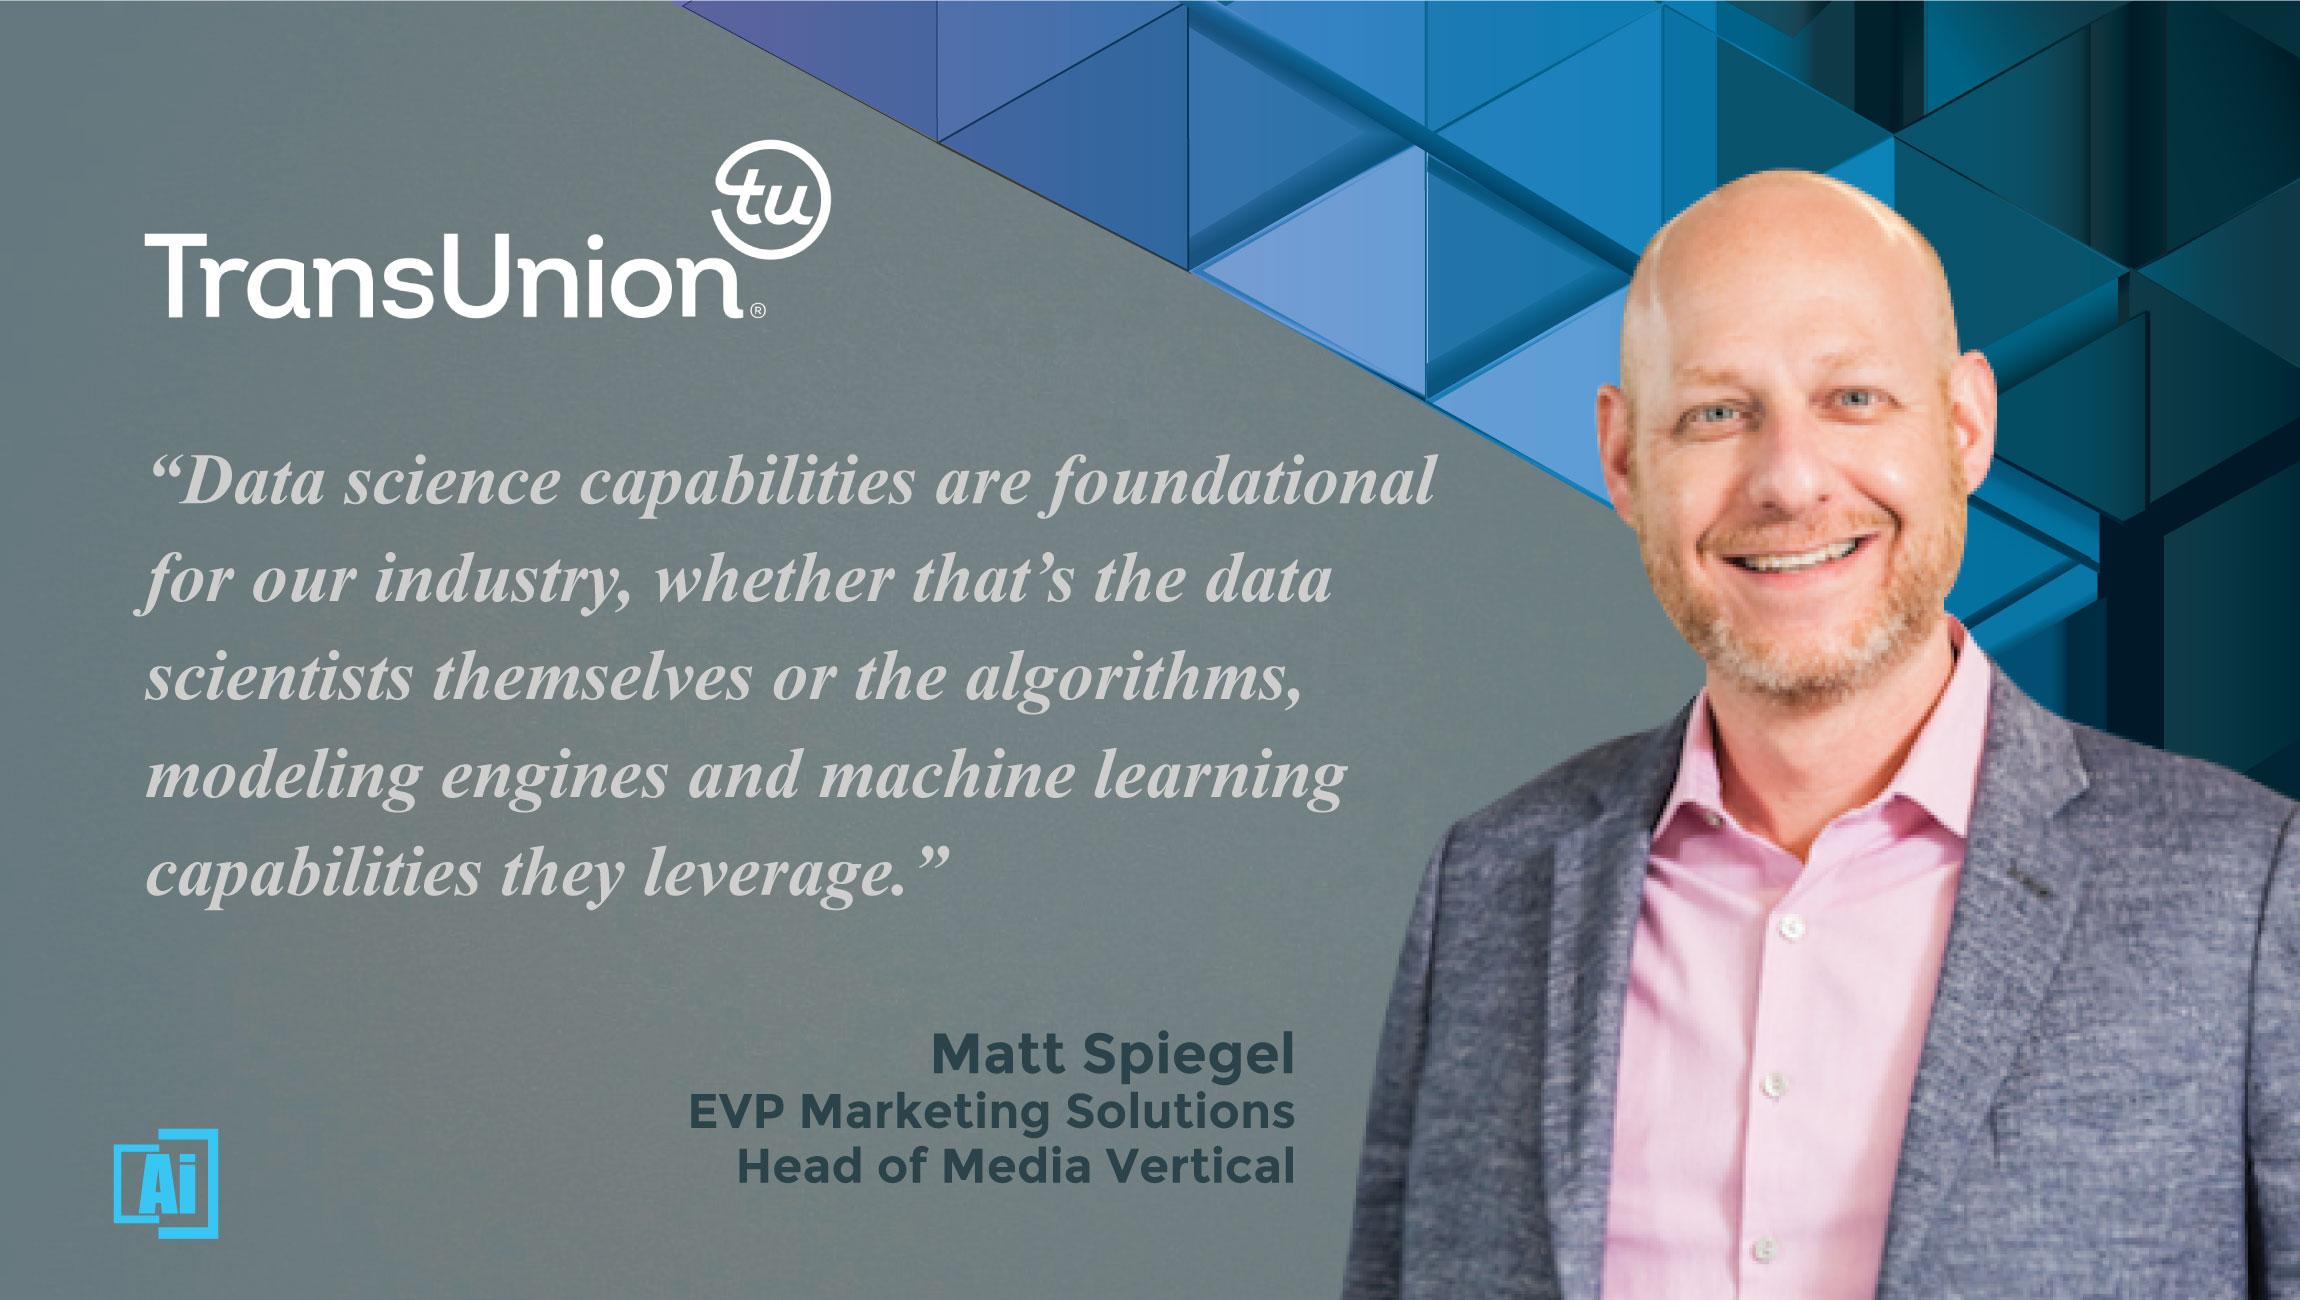 AiThority Interview With Matt Spiegel, EVP of Marketing Solutions at TransUnion